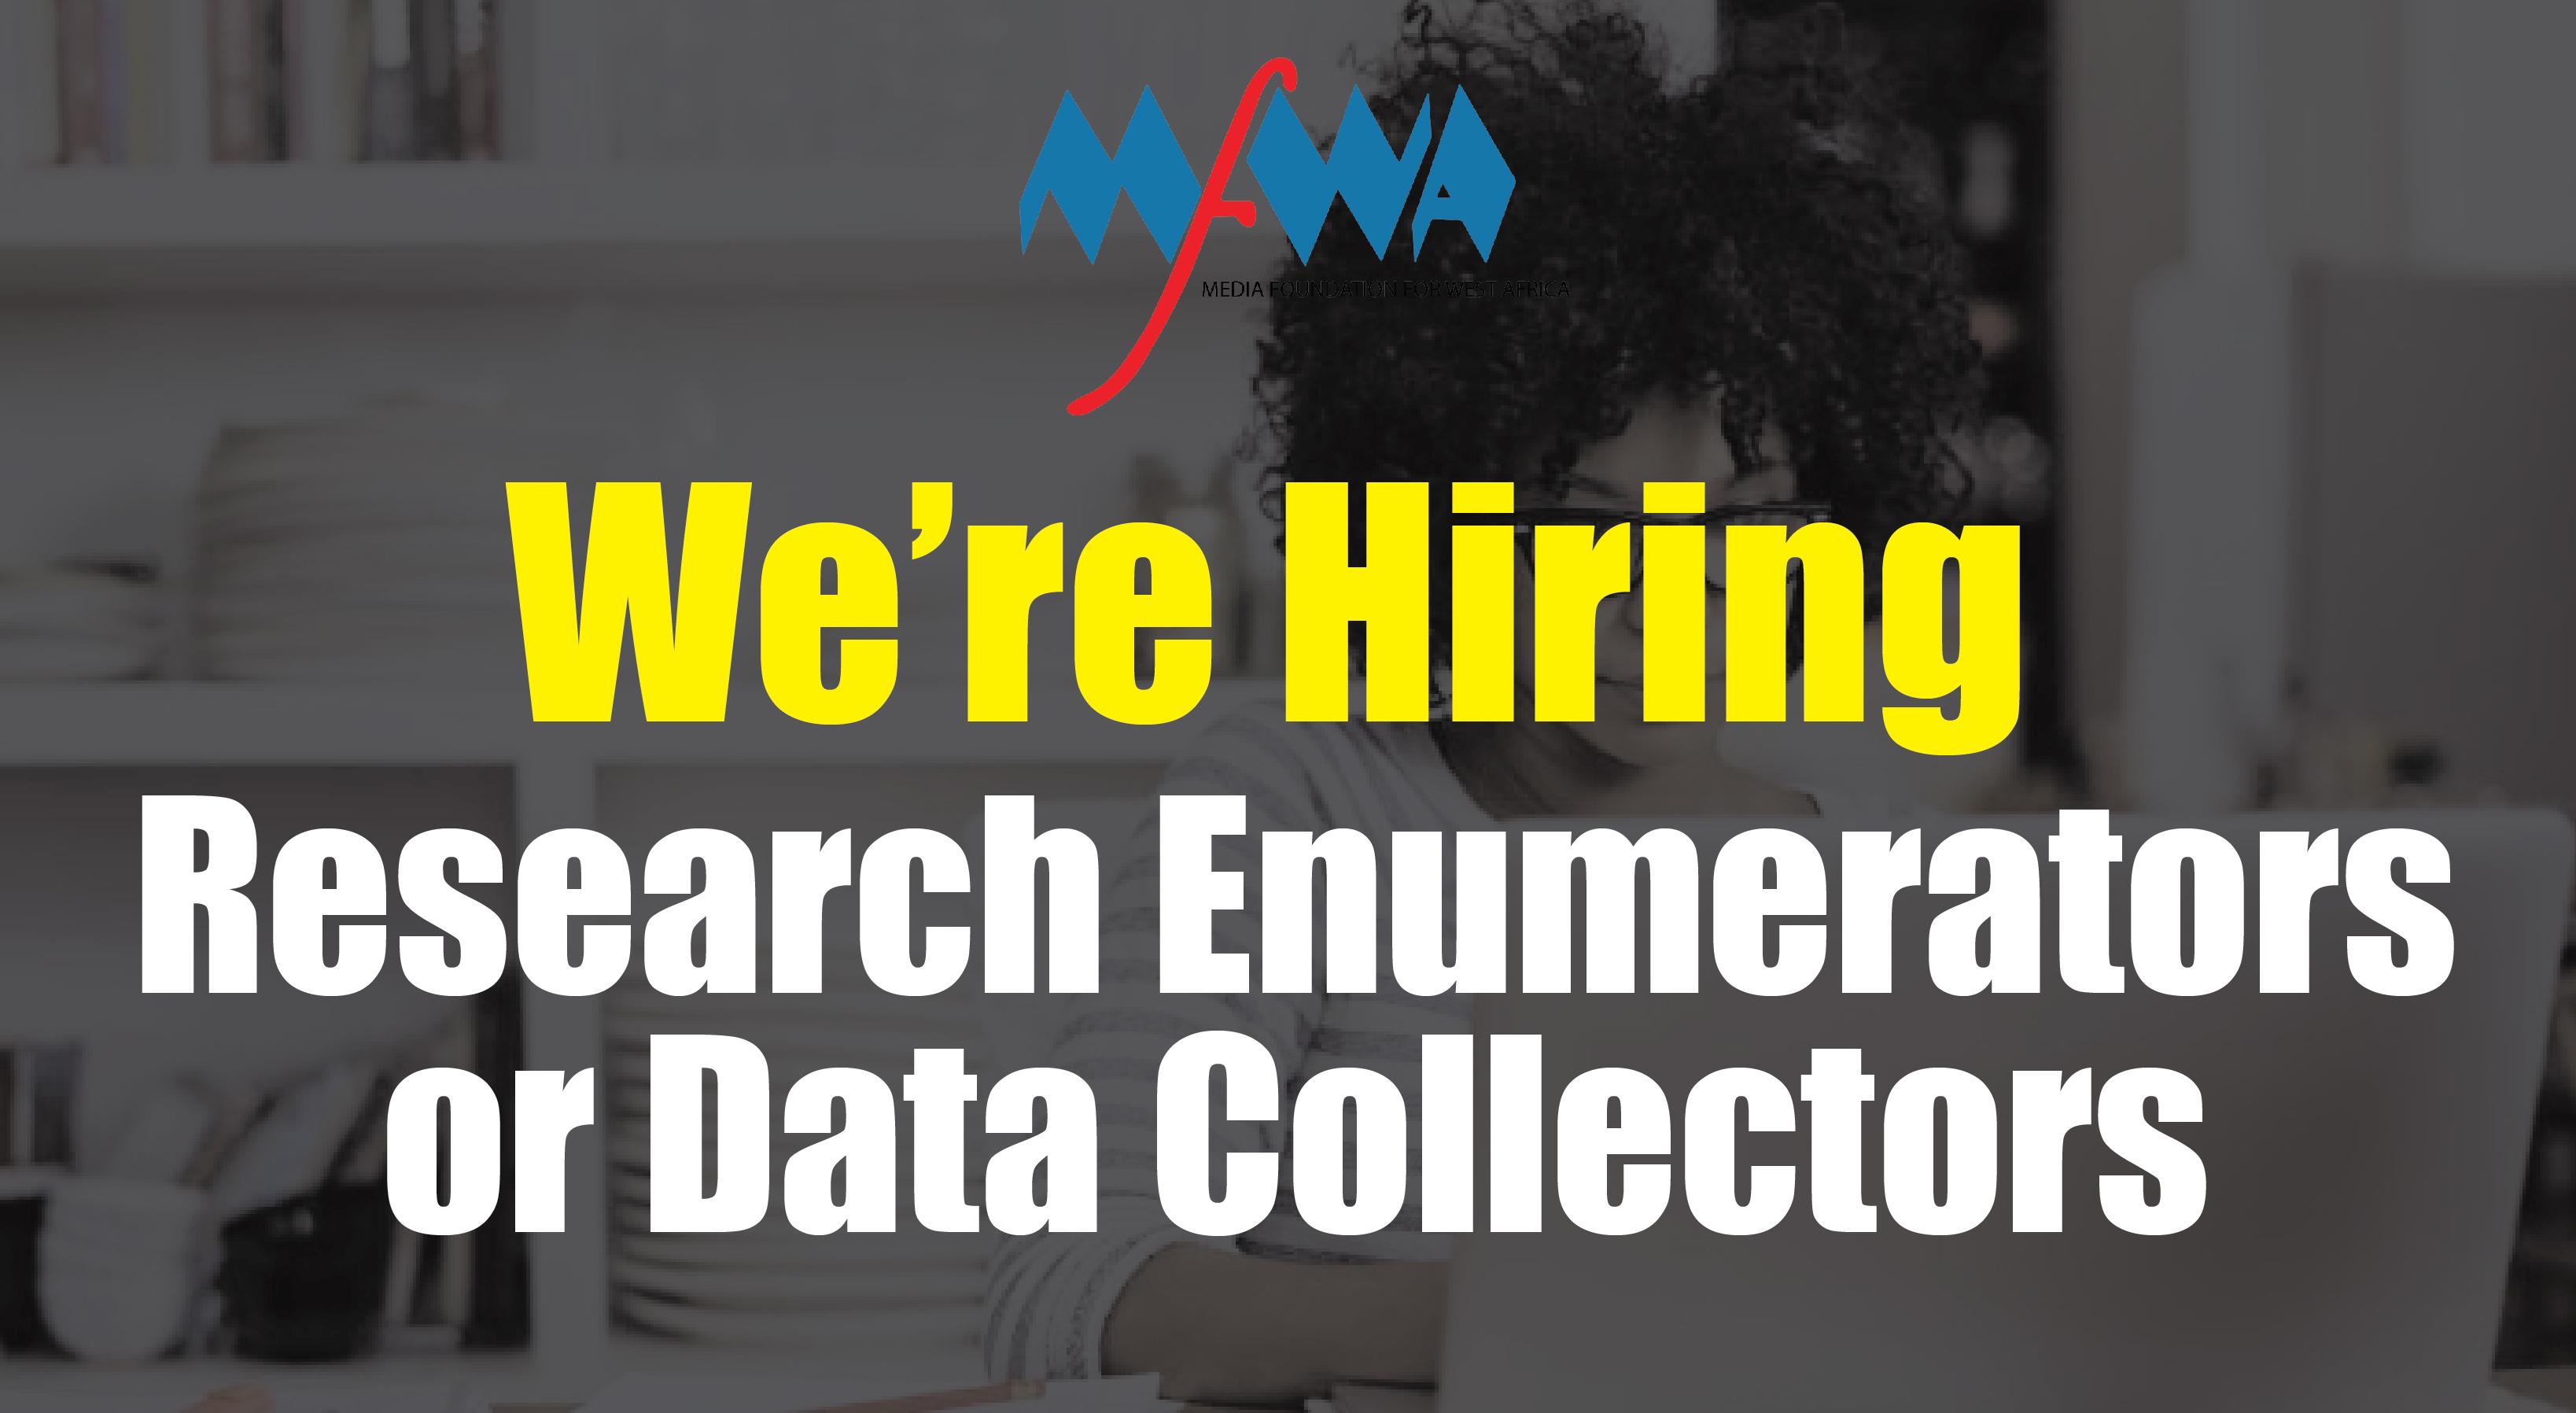 Call for Research Enumerators or Data Collectors - Media Foundation